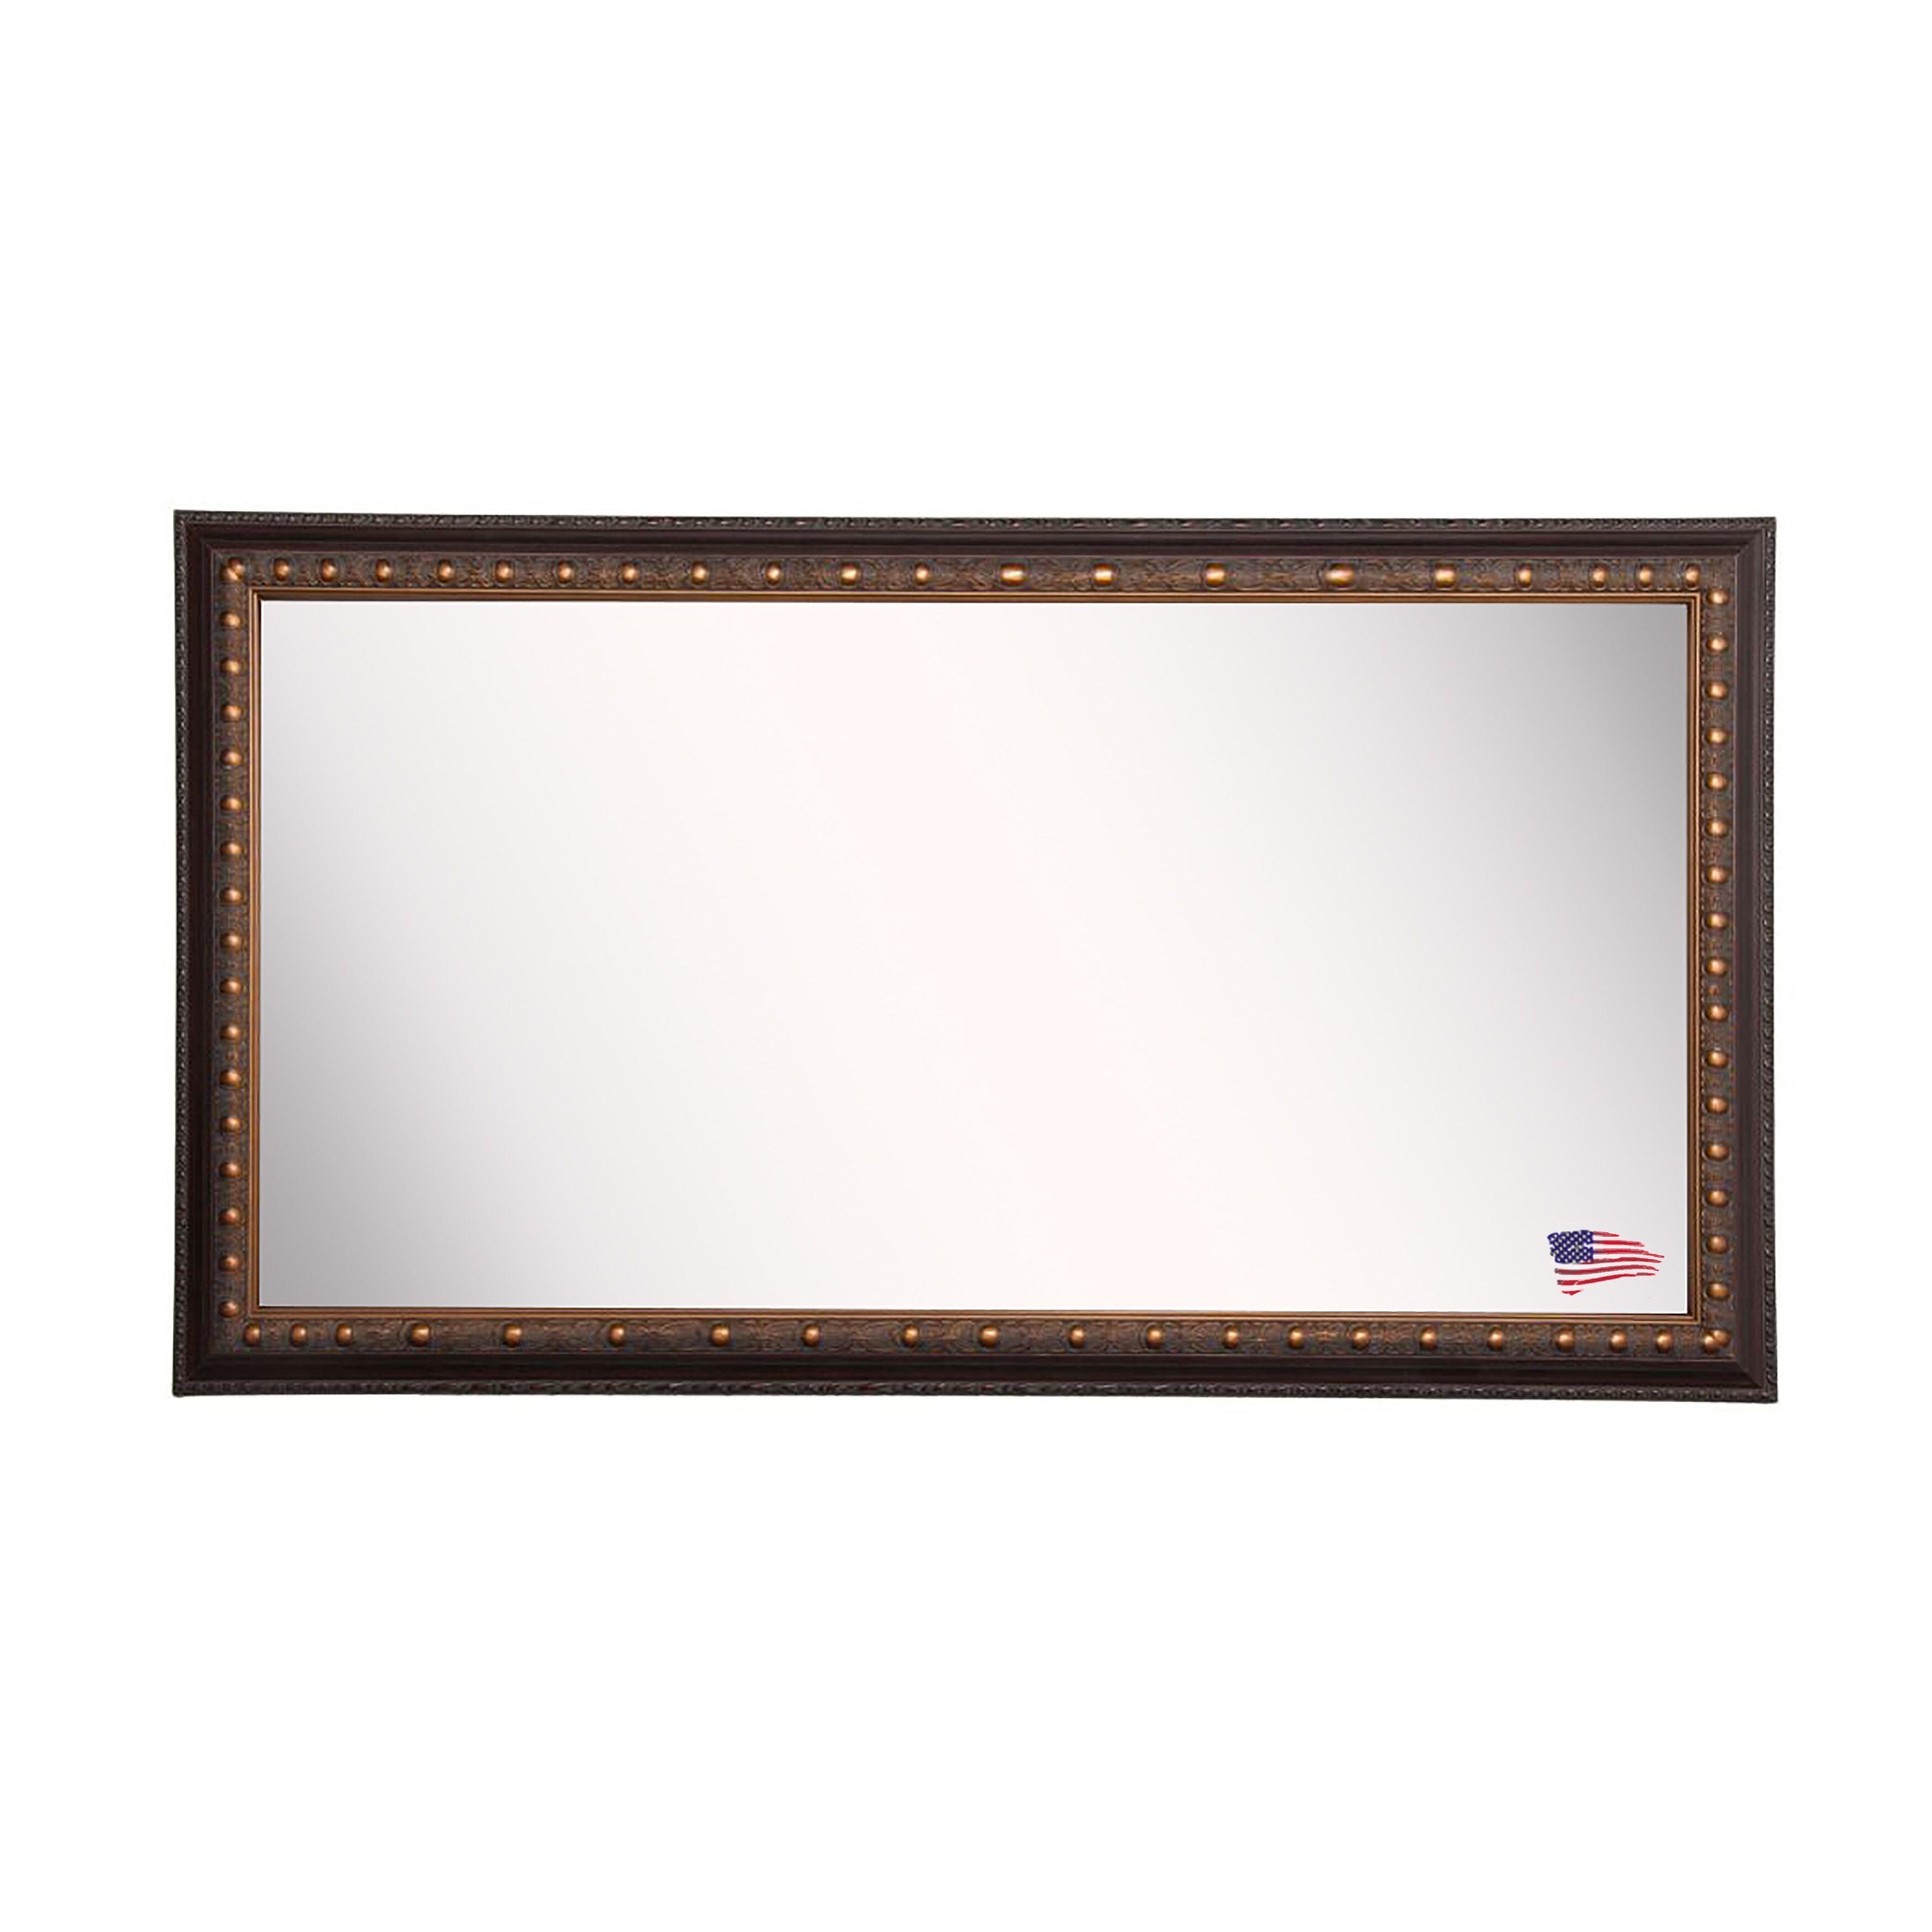 Rayne mirrors traditional cameo double vanity wall mirror for Traditional mirror